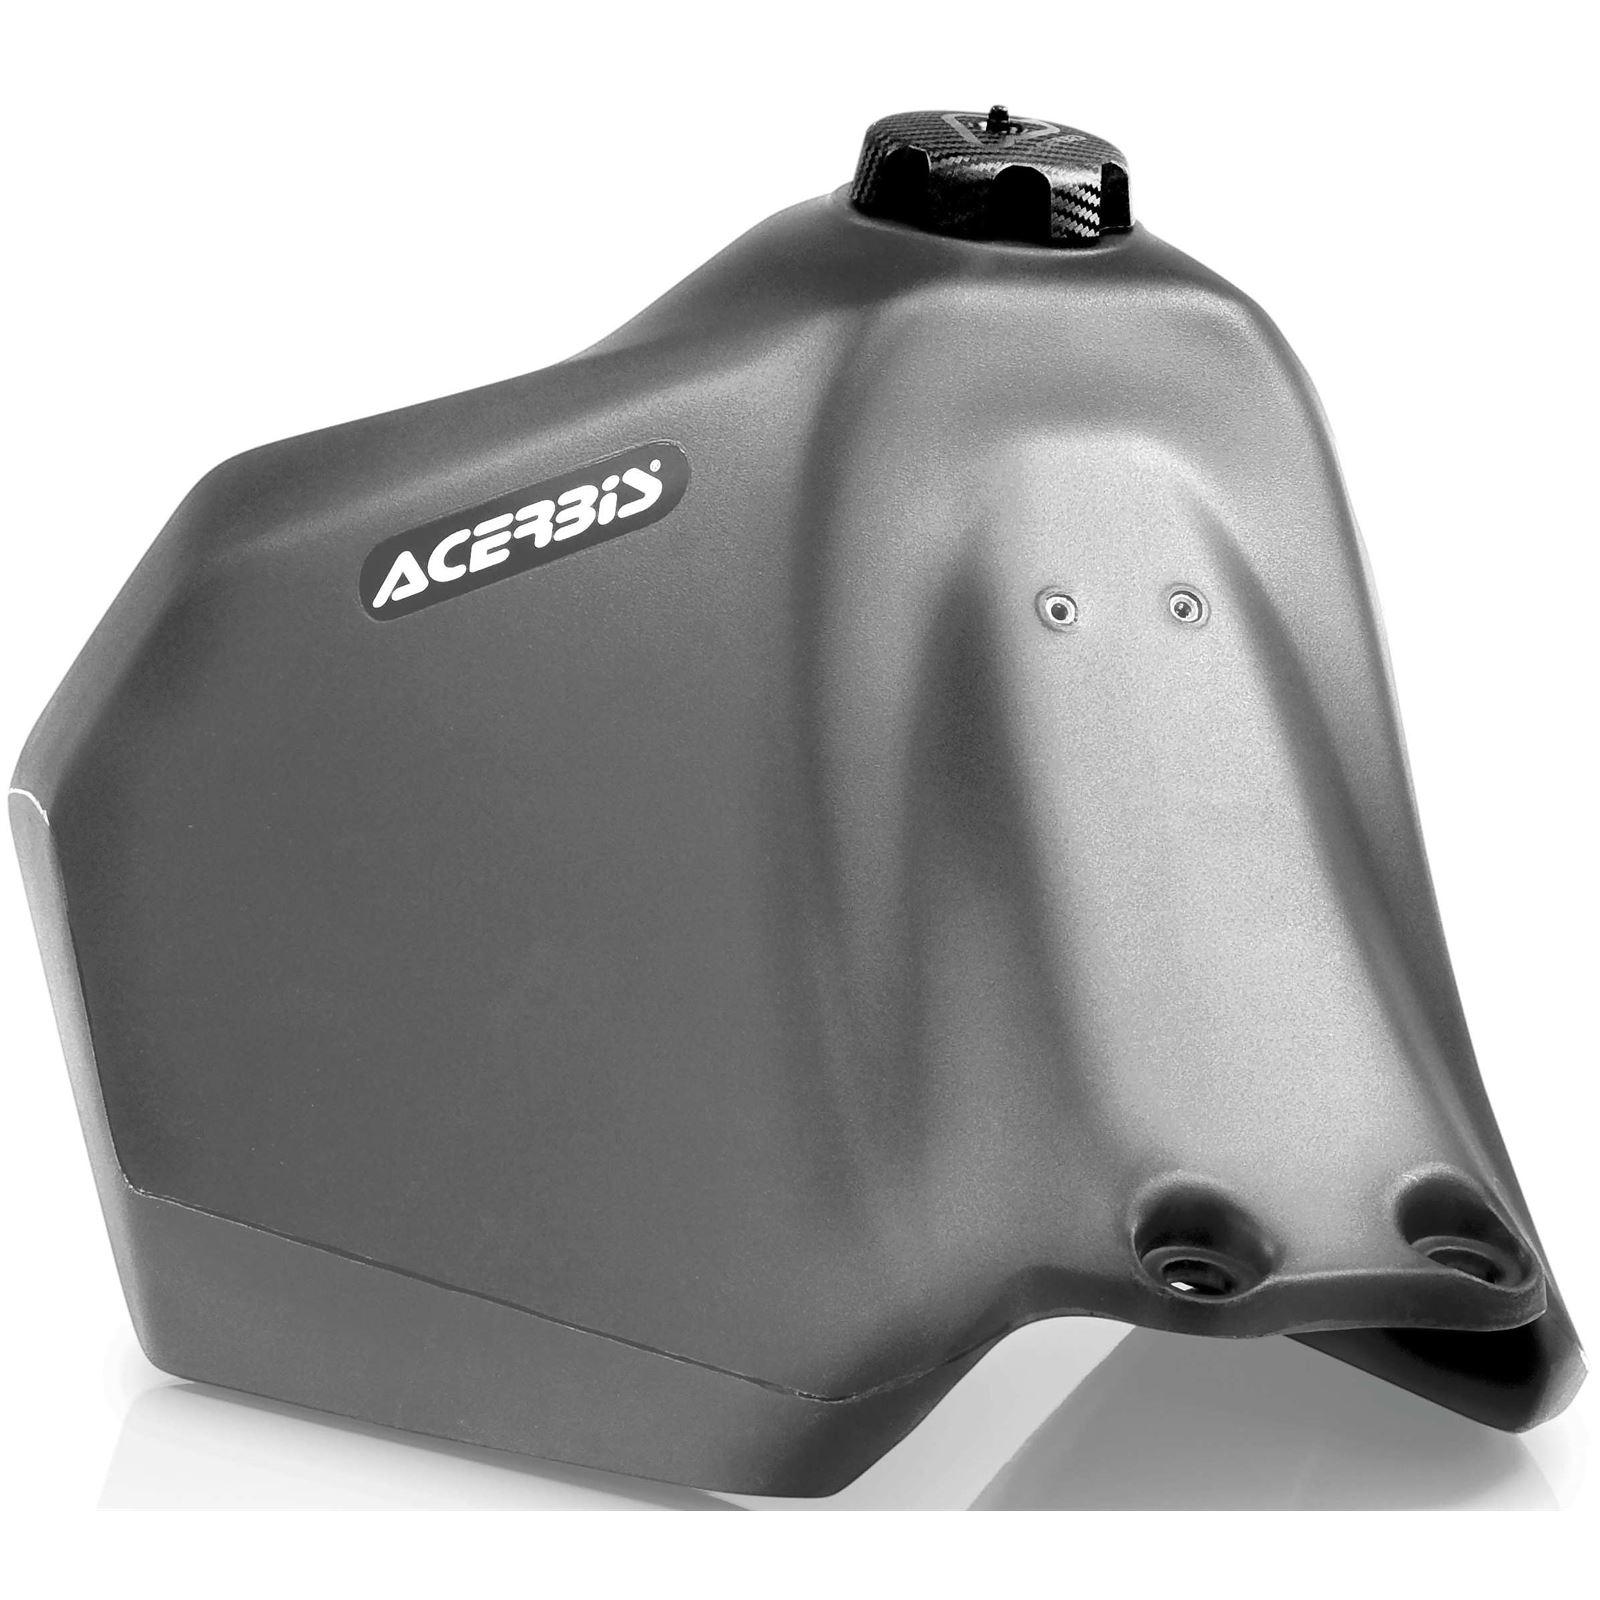 Acerbis Large Capacity Fuel Tank